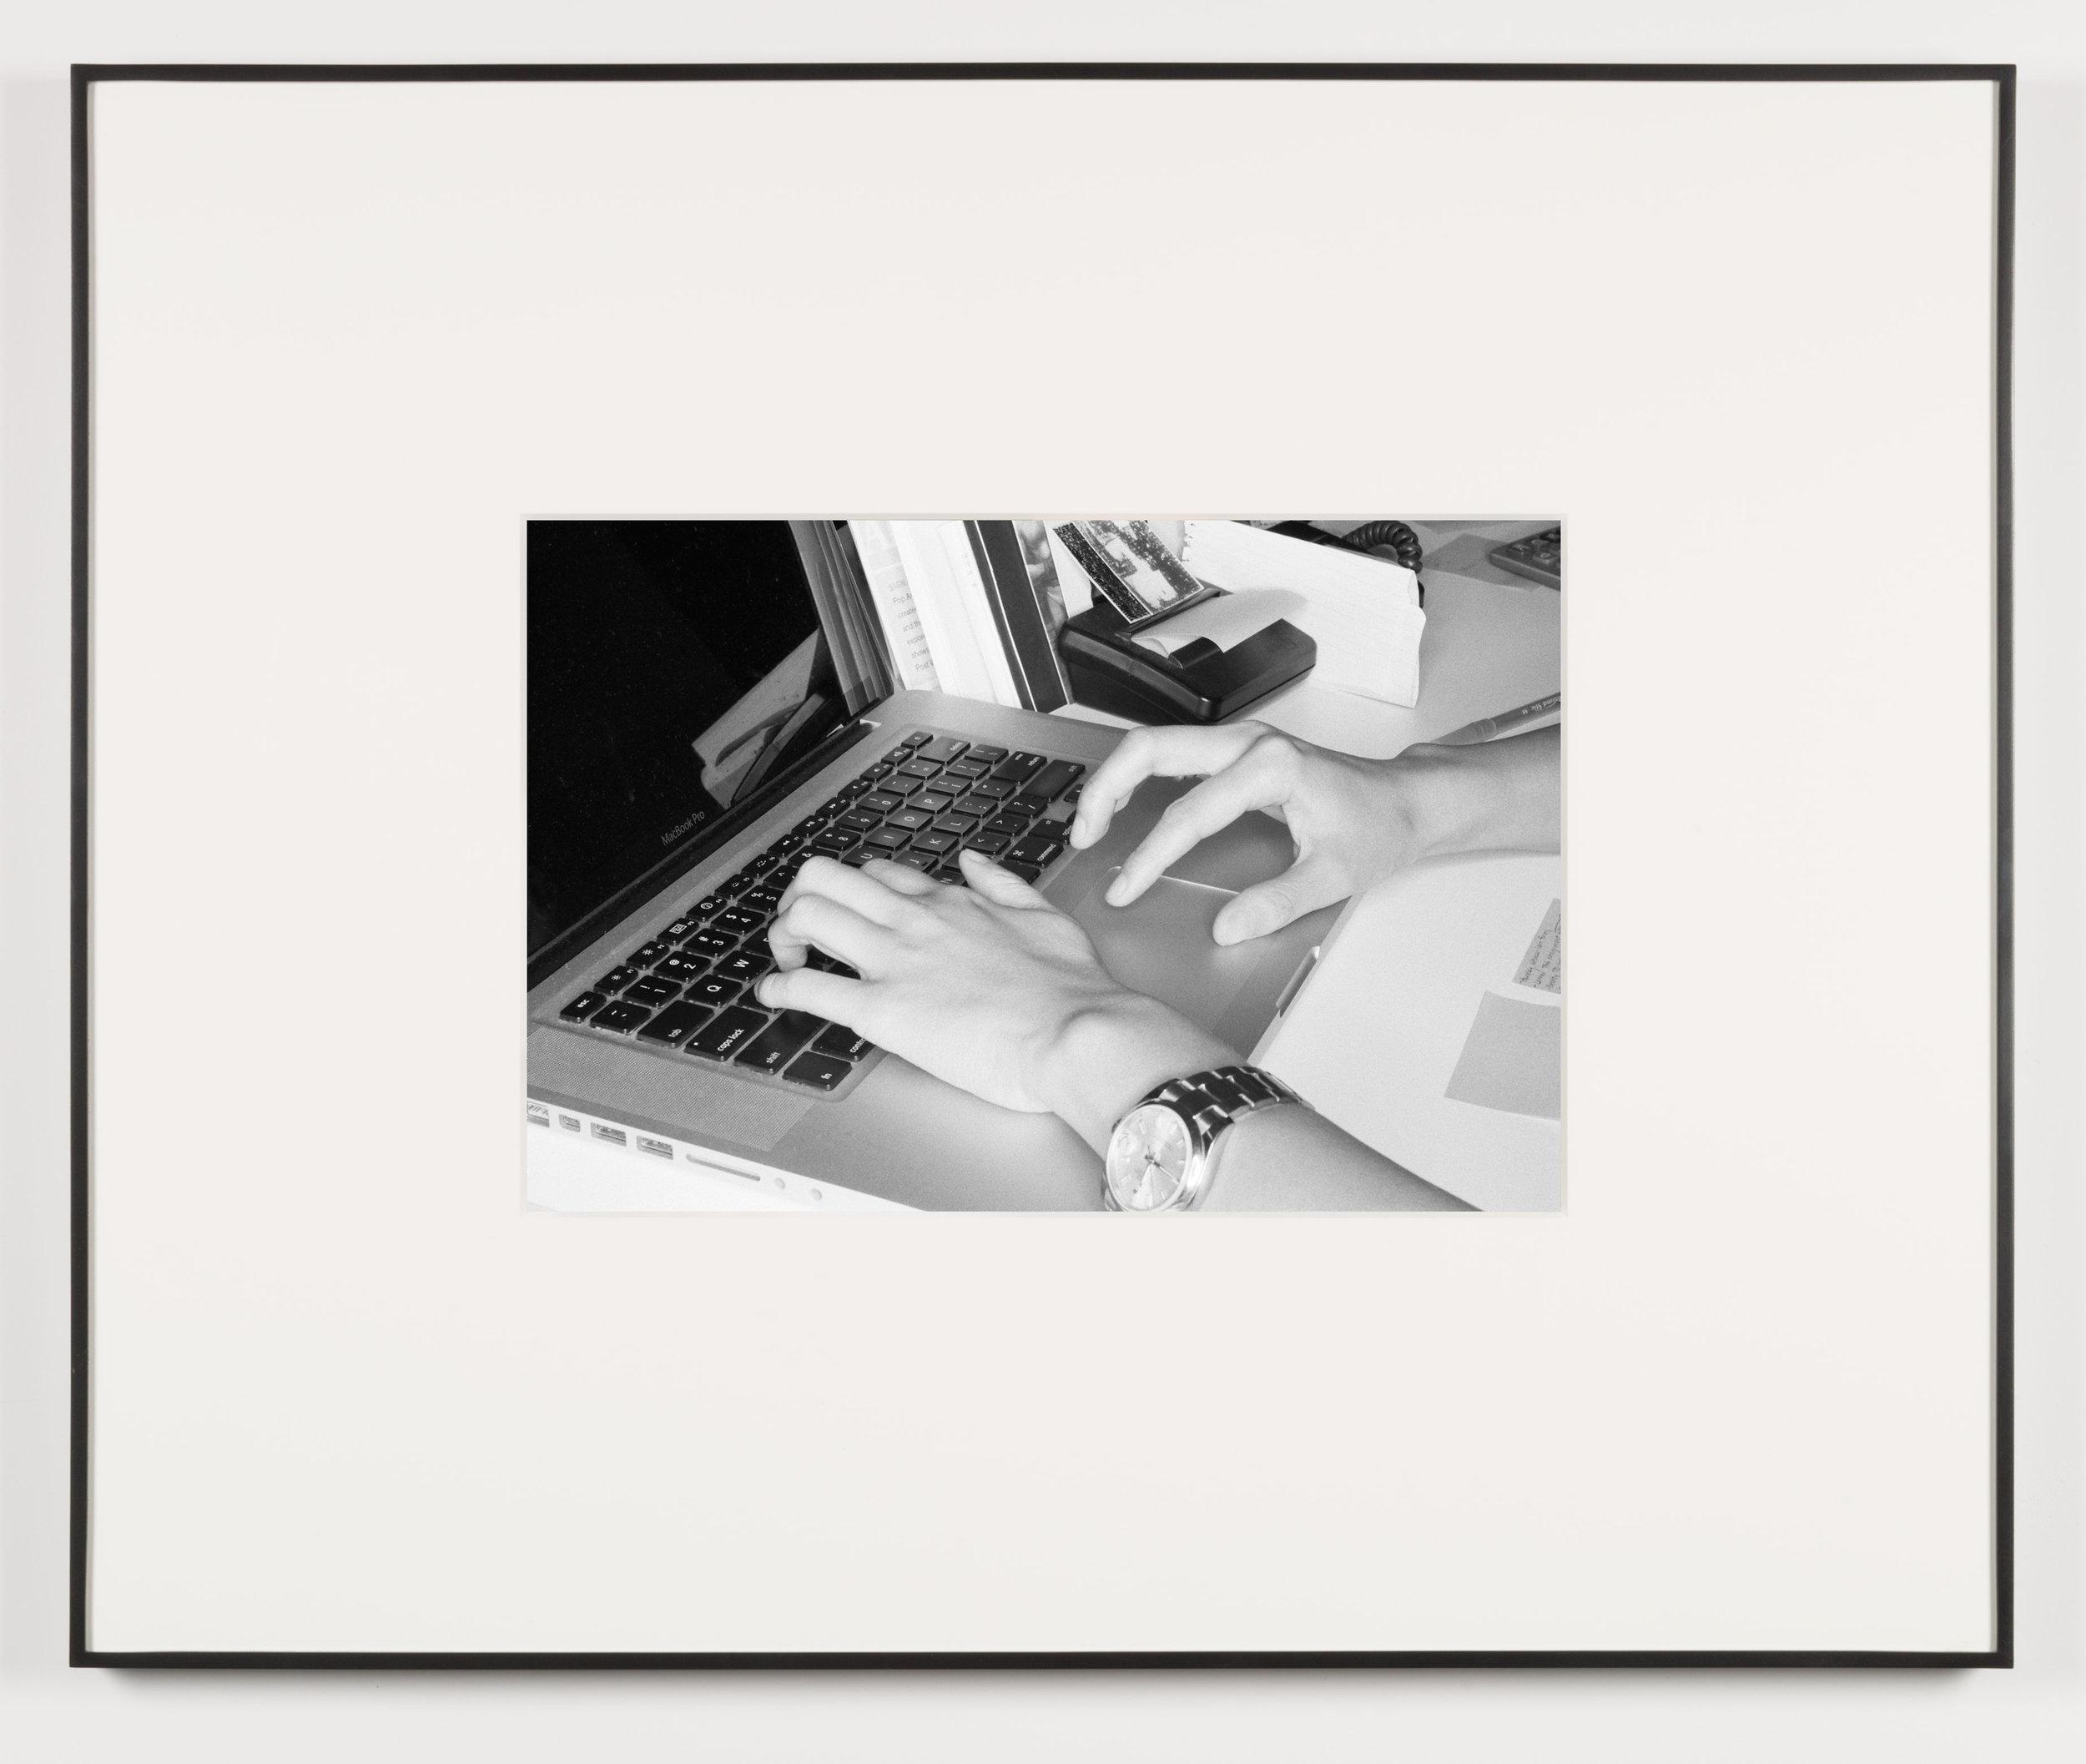 Die Qual der Lust (Los Angeles, California, August 15, 2013)   2014  Black and white digital fiber print  13 1/2 x 20 inches   Art Handling, 2011–    Selected Bodies of Work, 2014